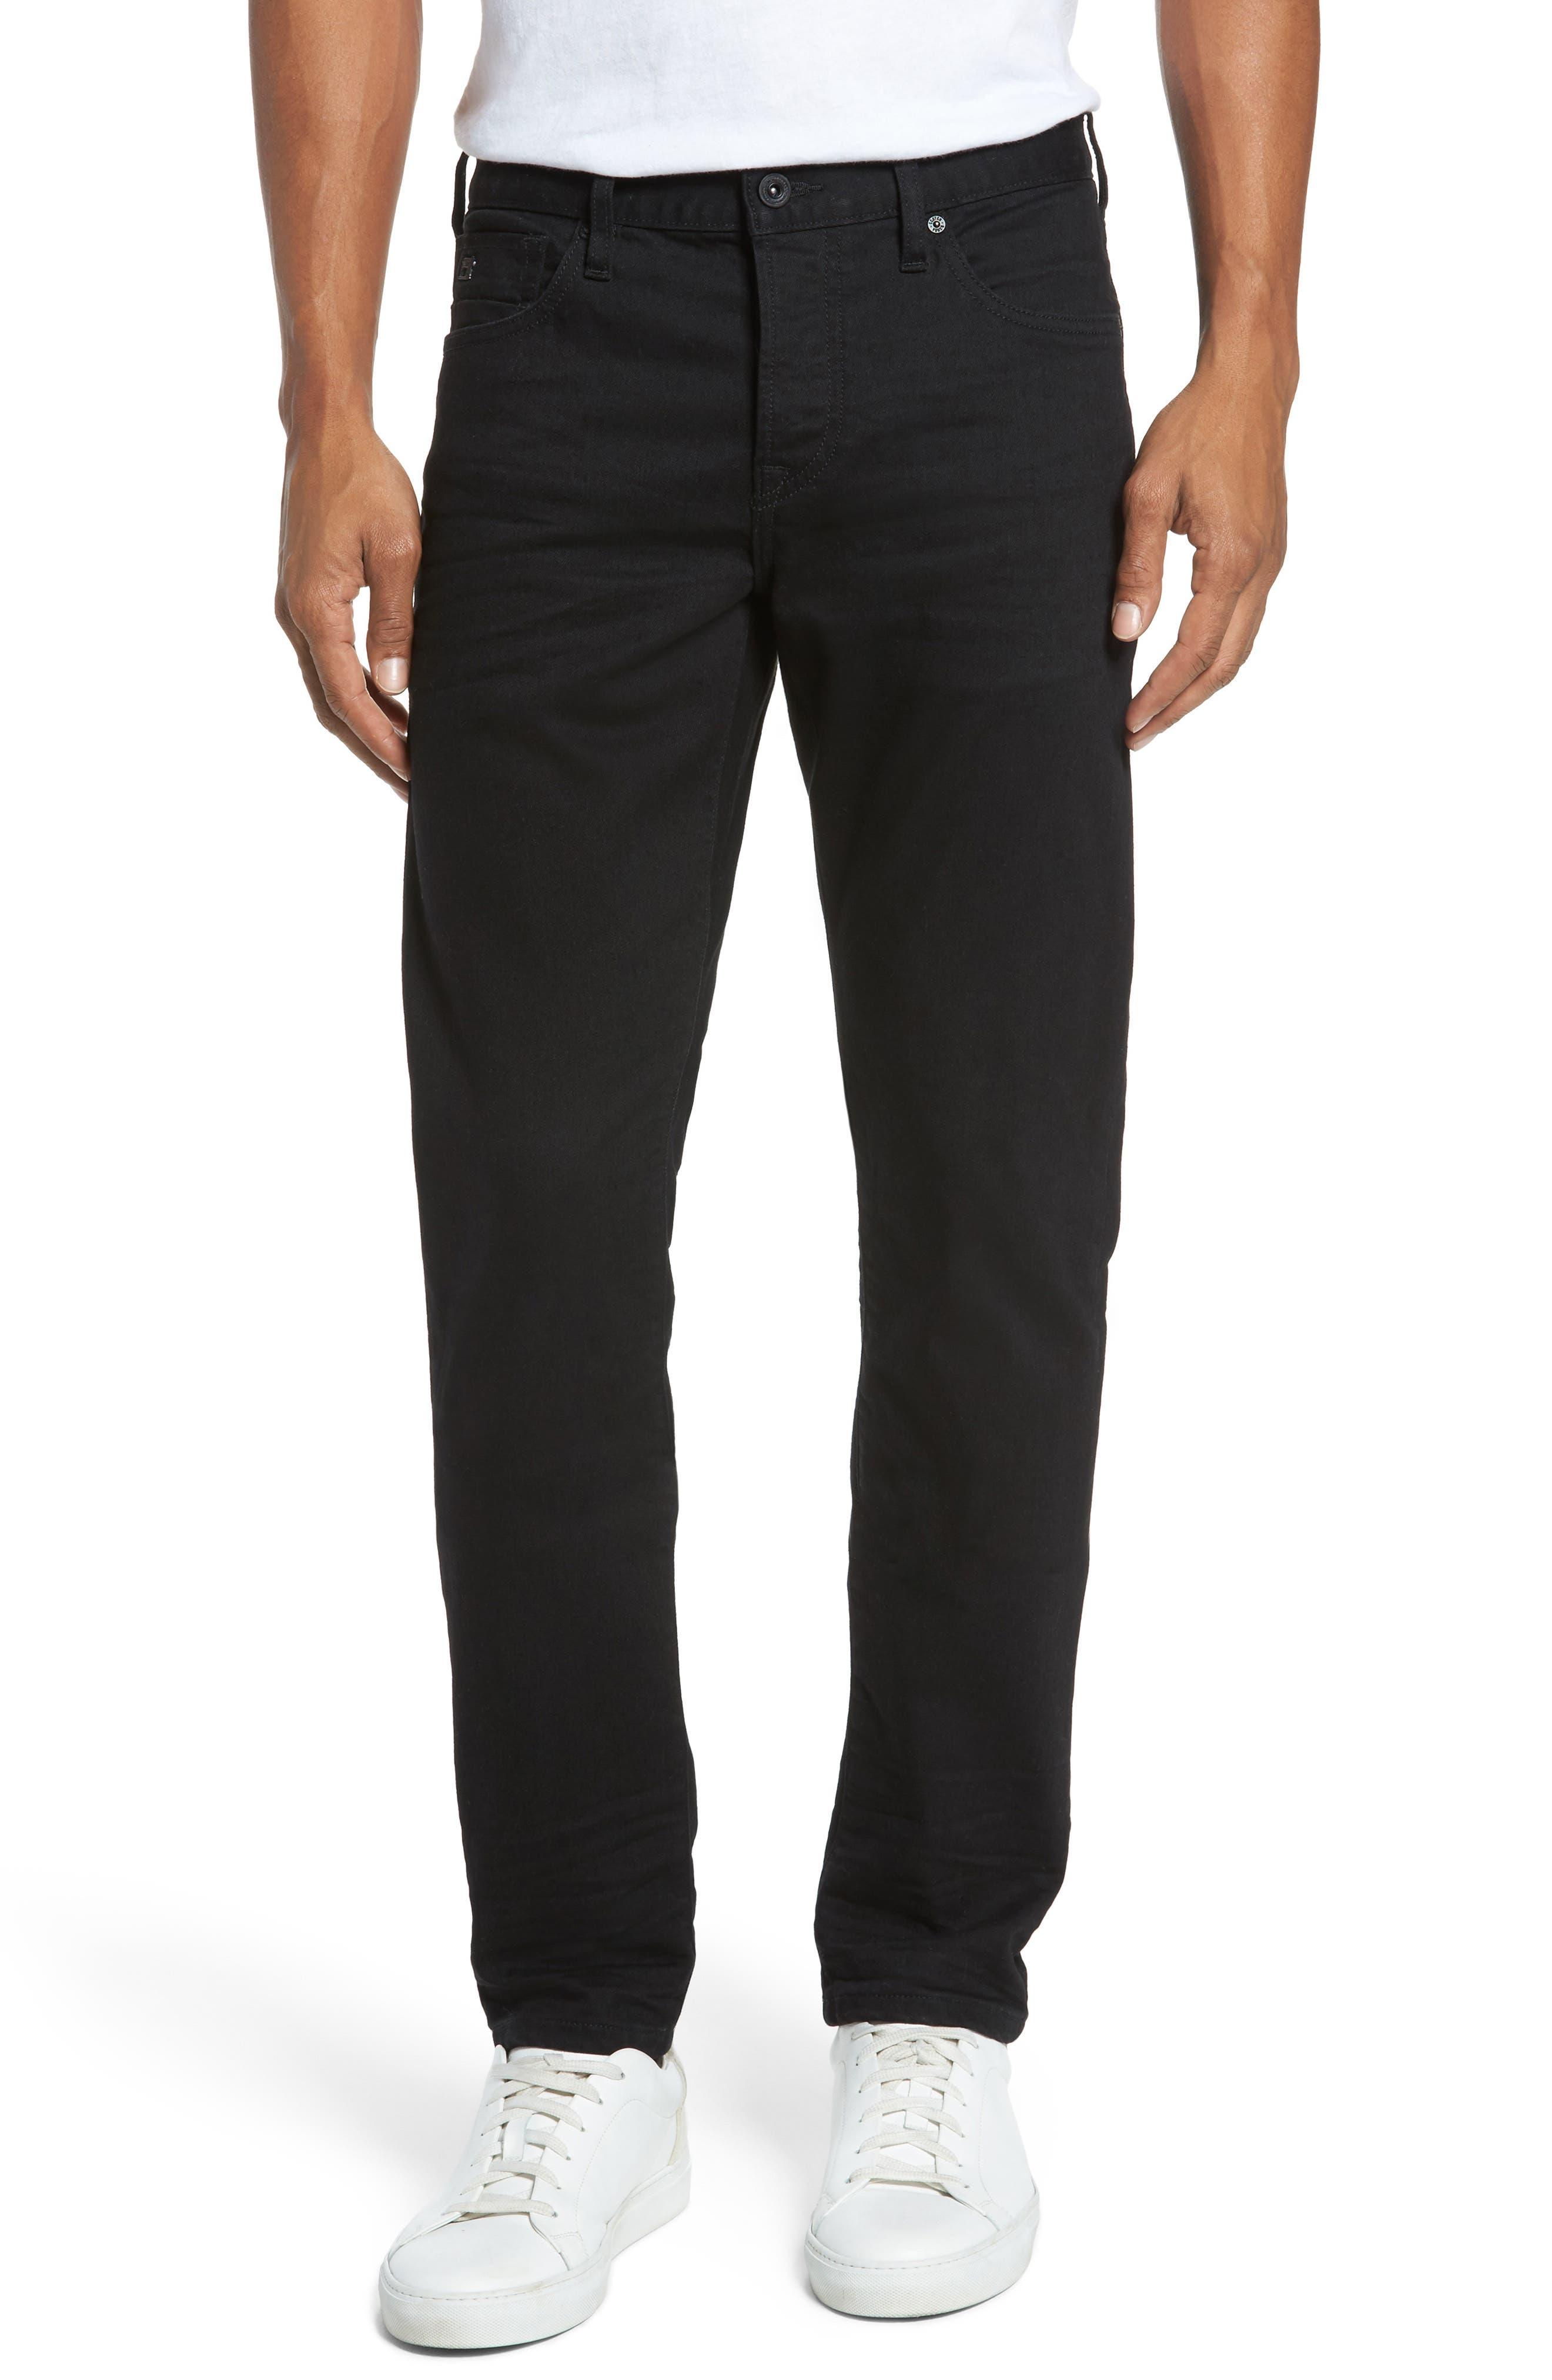 Ralston Slim Straight Leg Jeans,                         Main,                         color, Stay Black